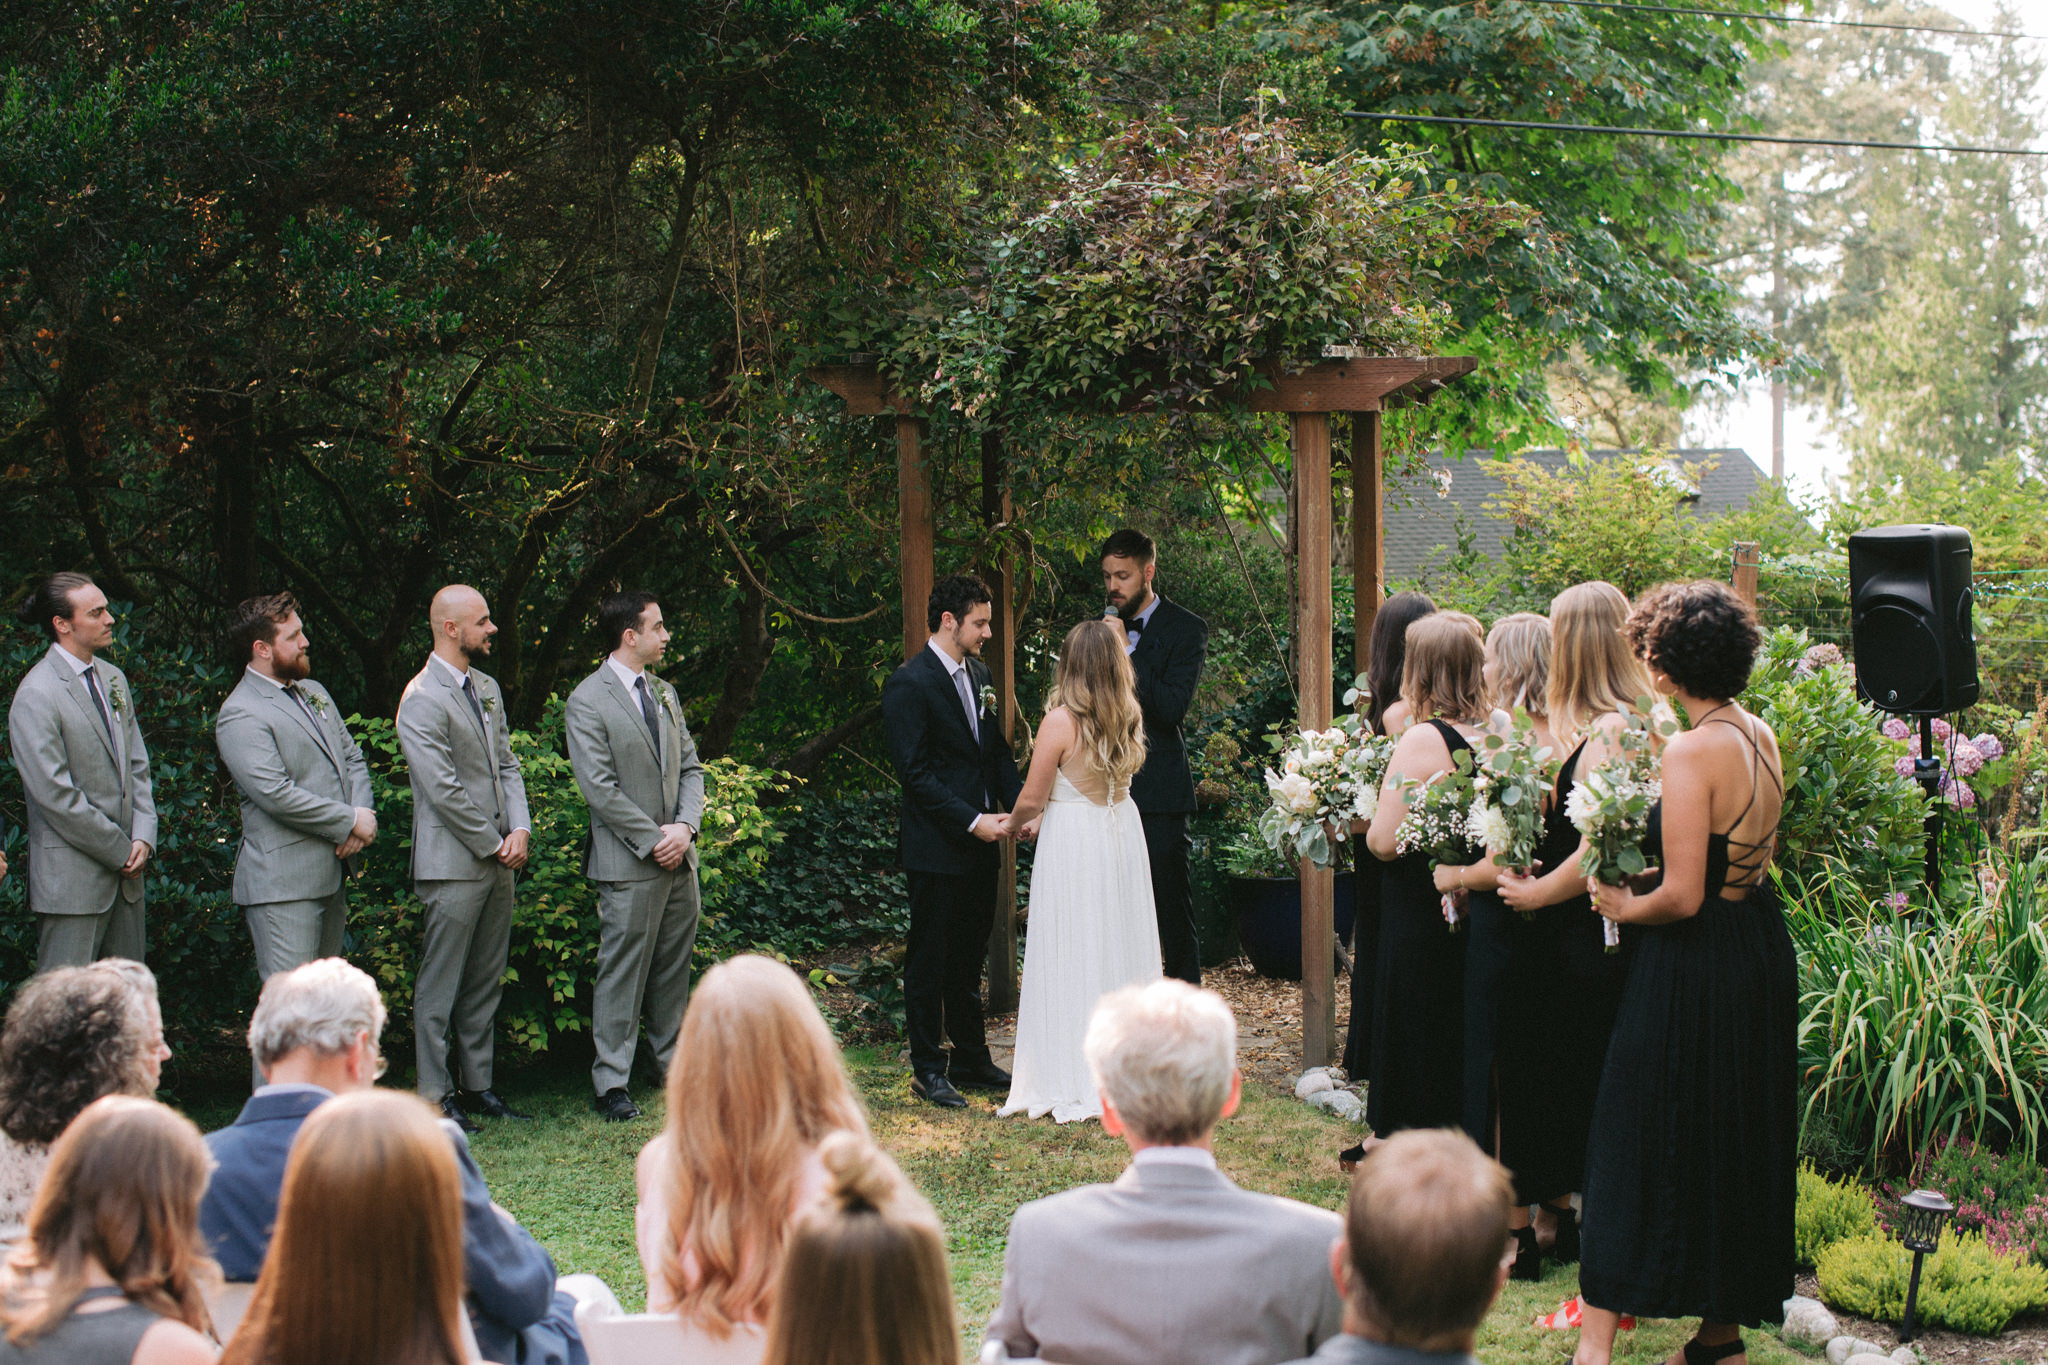 Backyard-Bainbridge-Island-Wedding-Alycia-Lovell-Photography-99.JPG